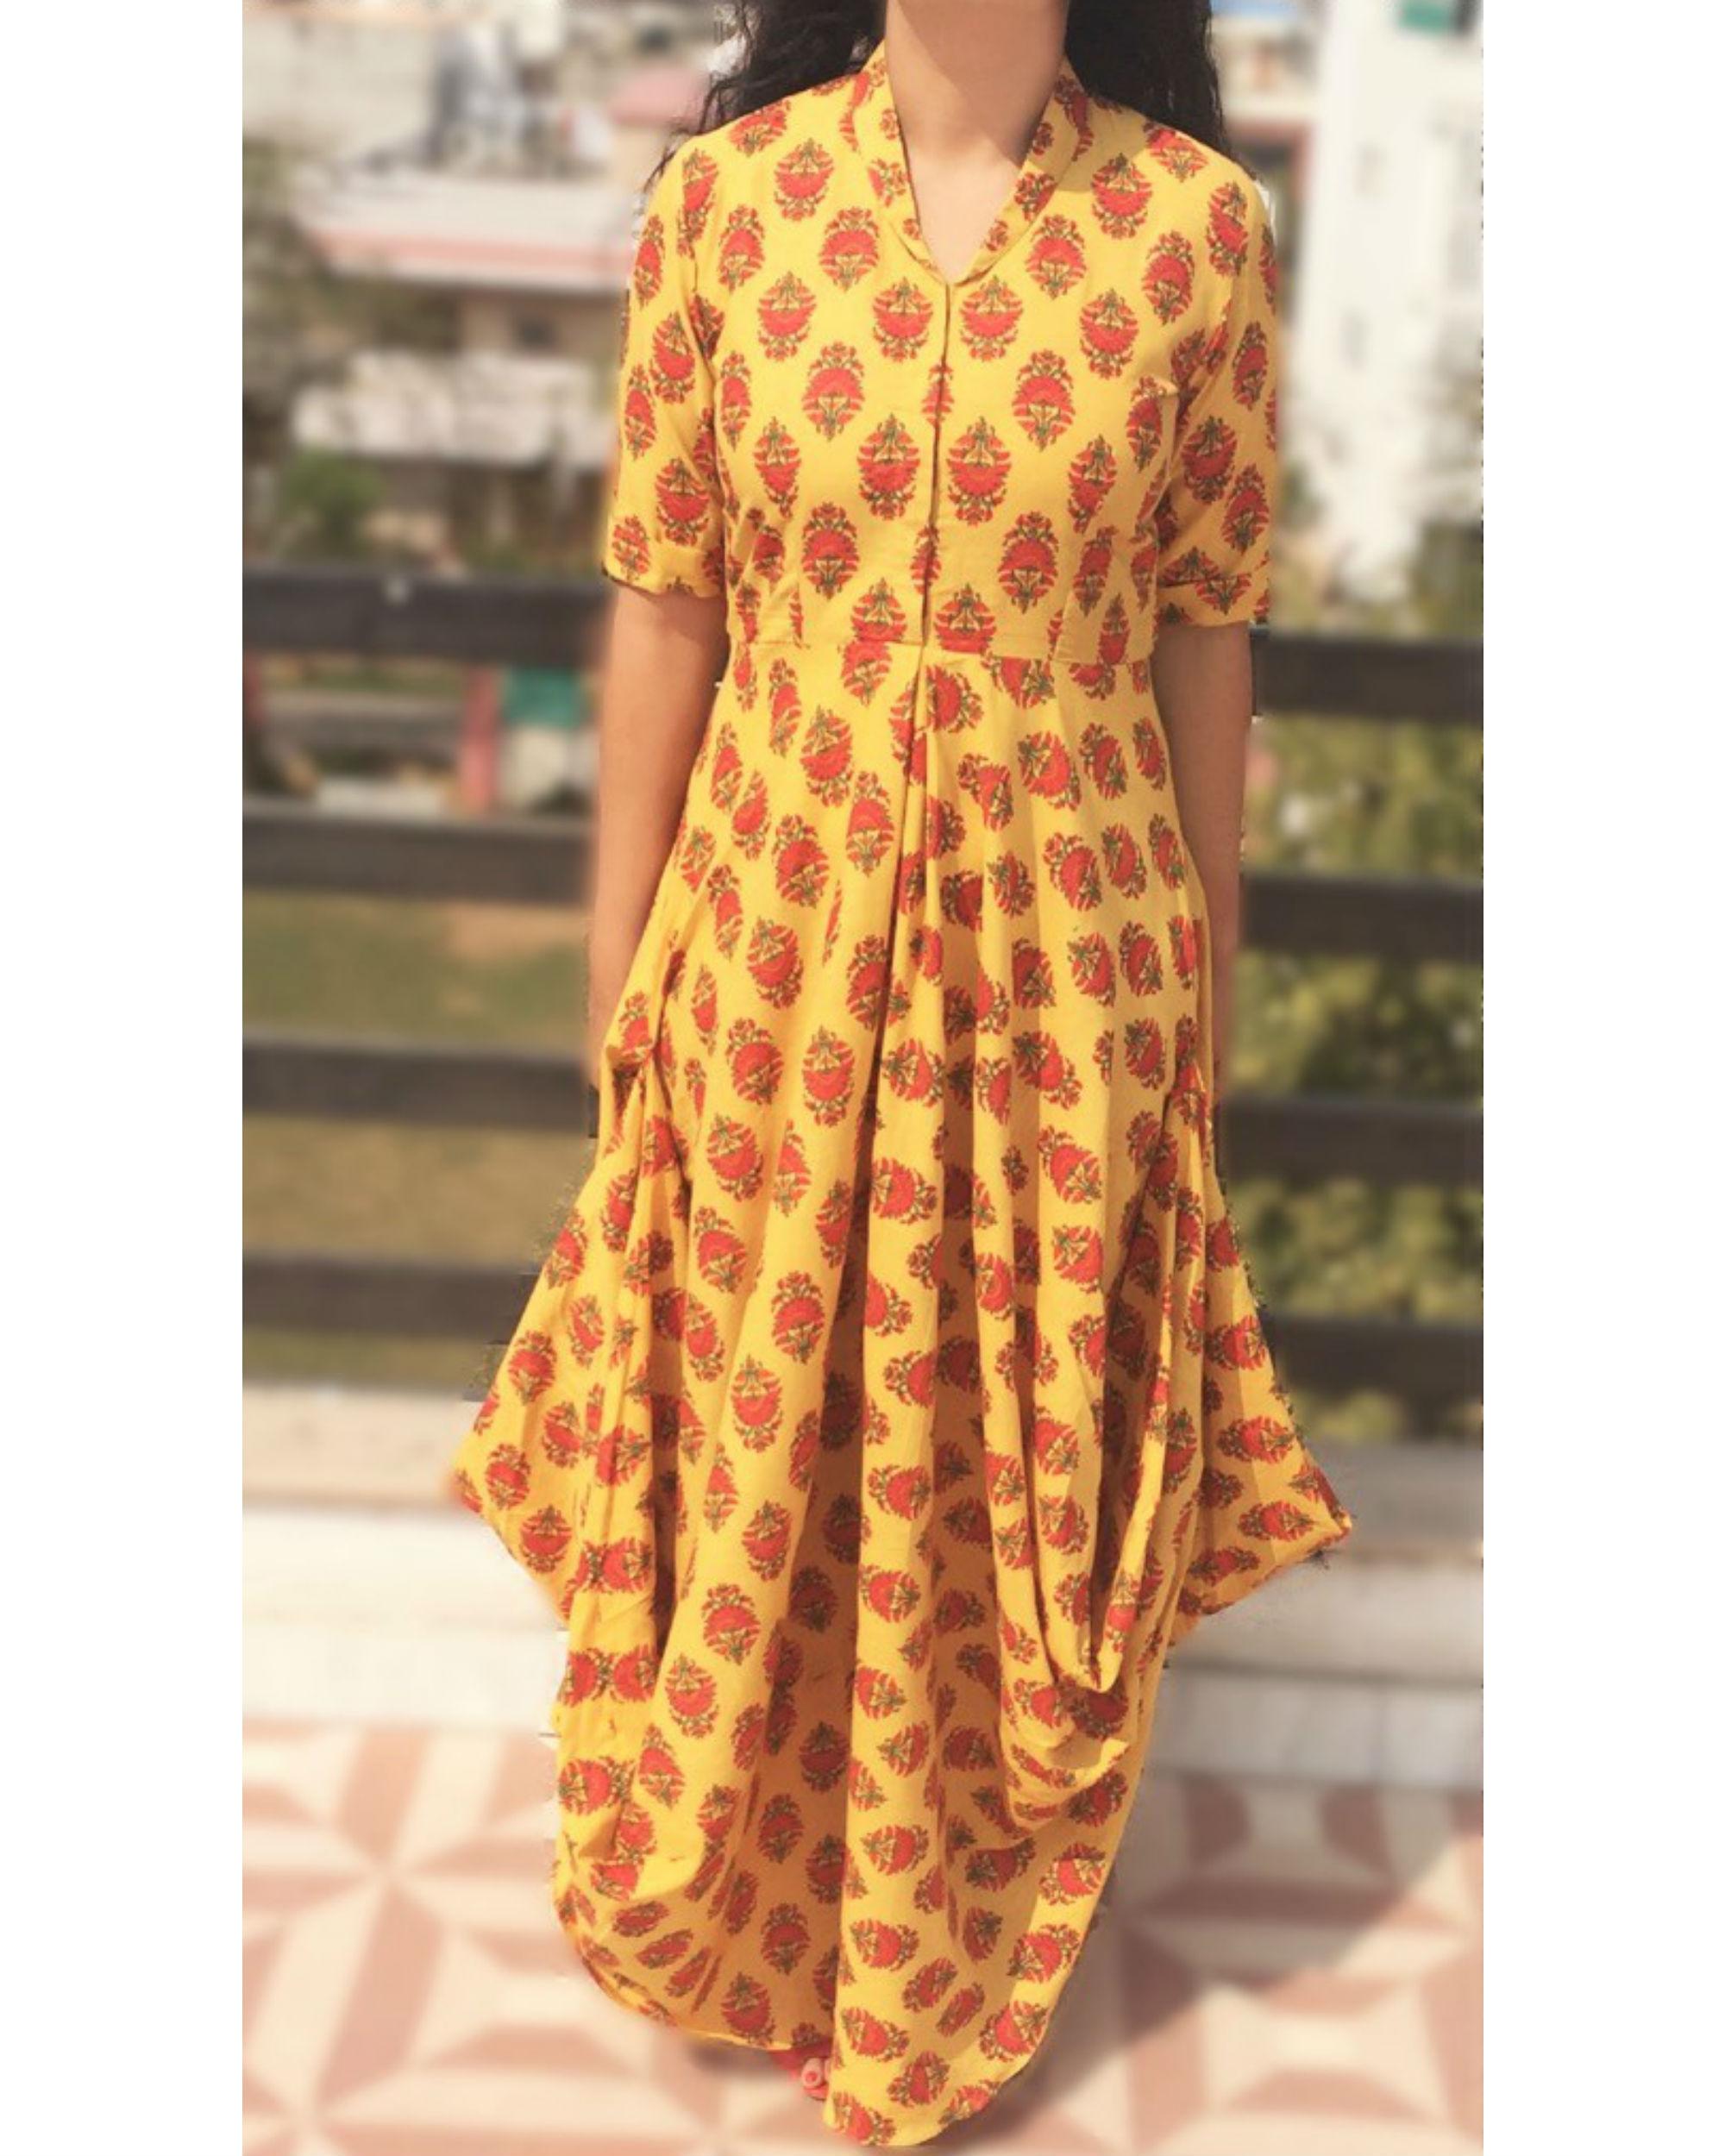 Mustrard draped dress